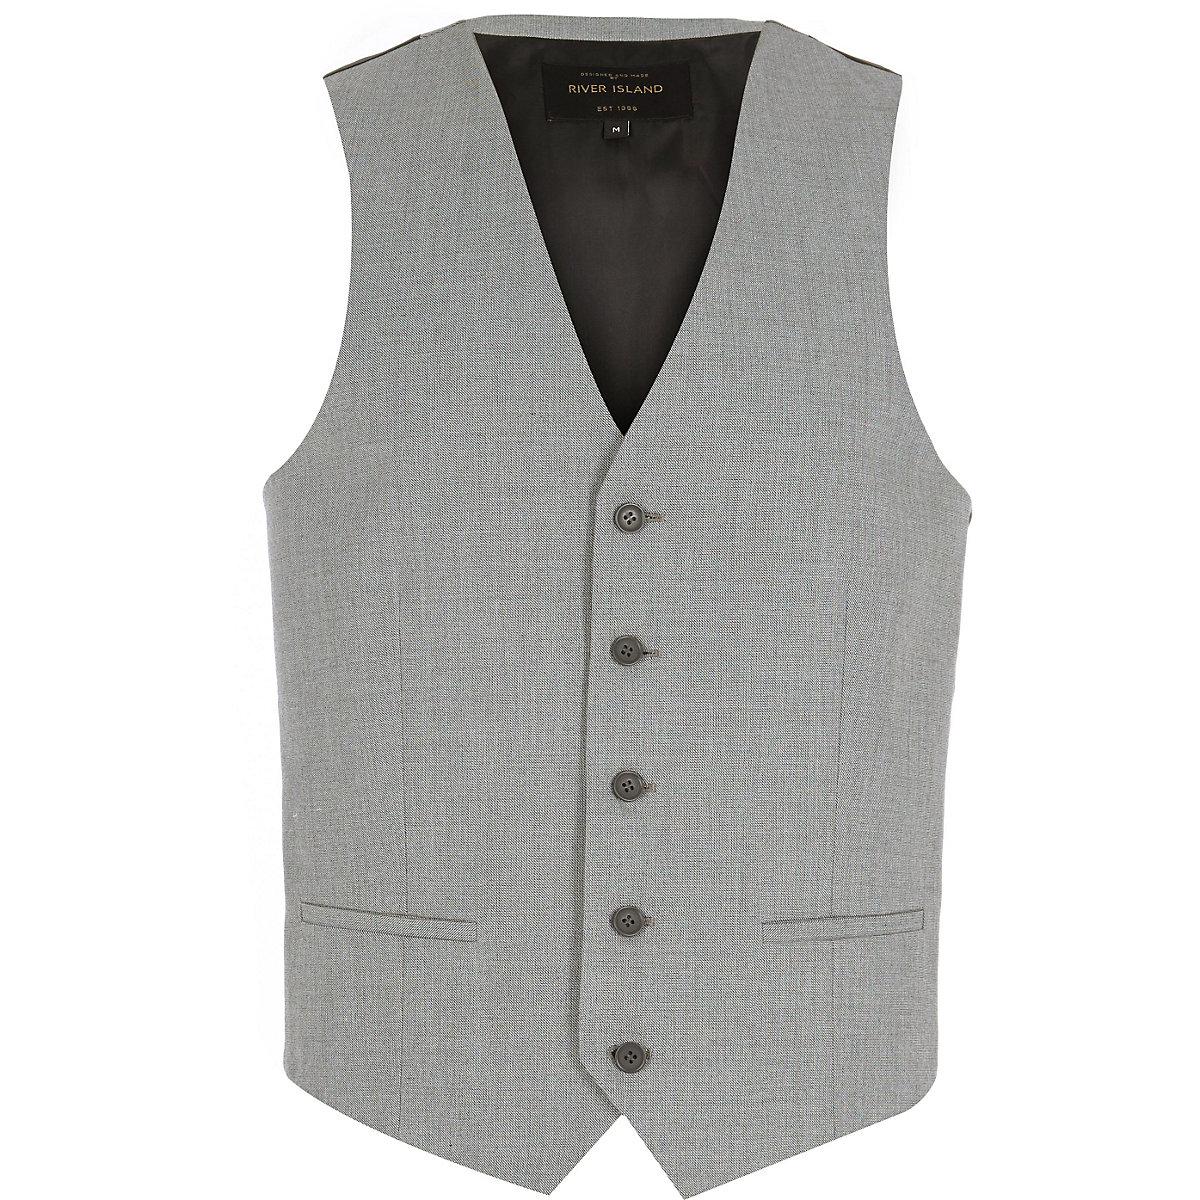 Light grey single breasted vest